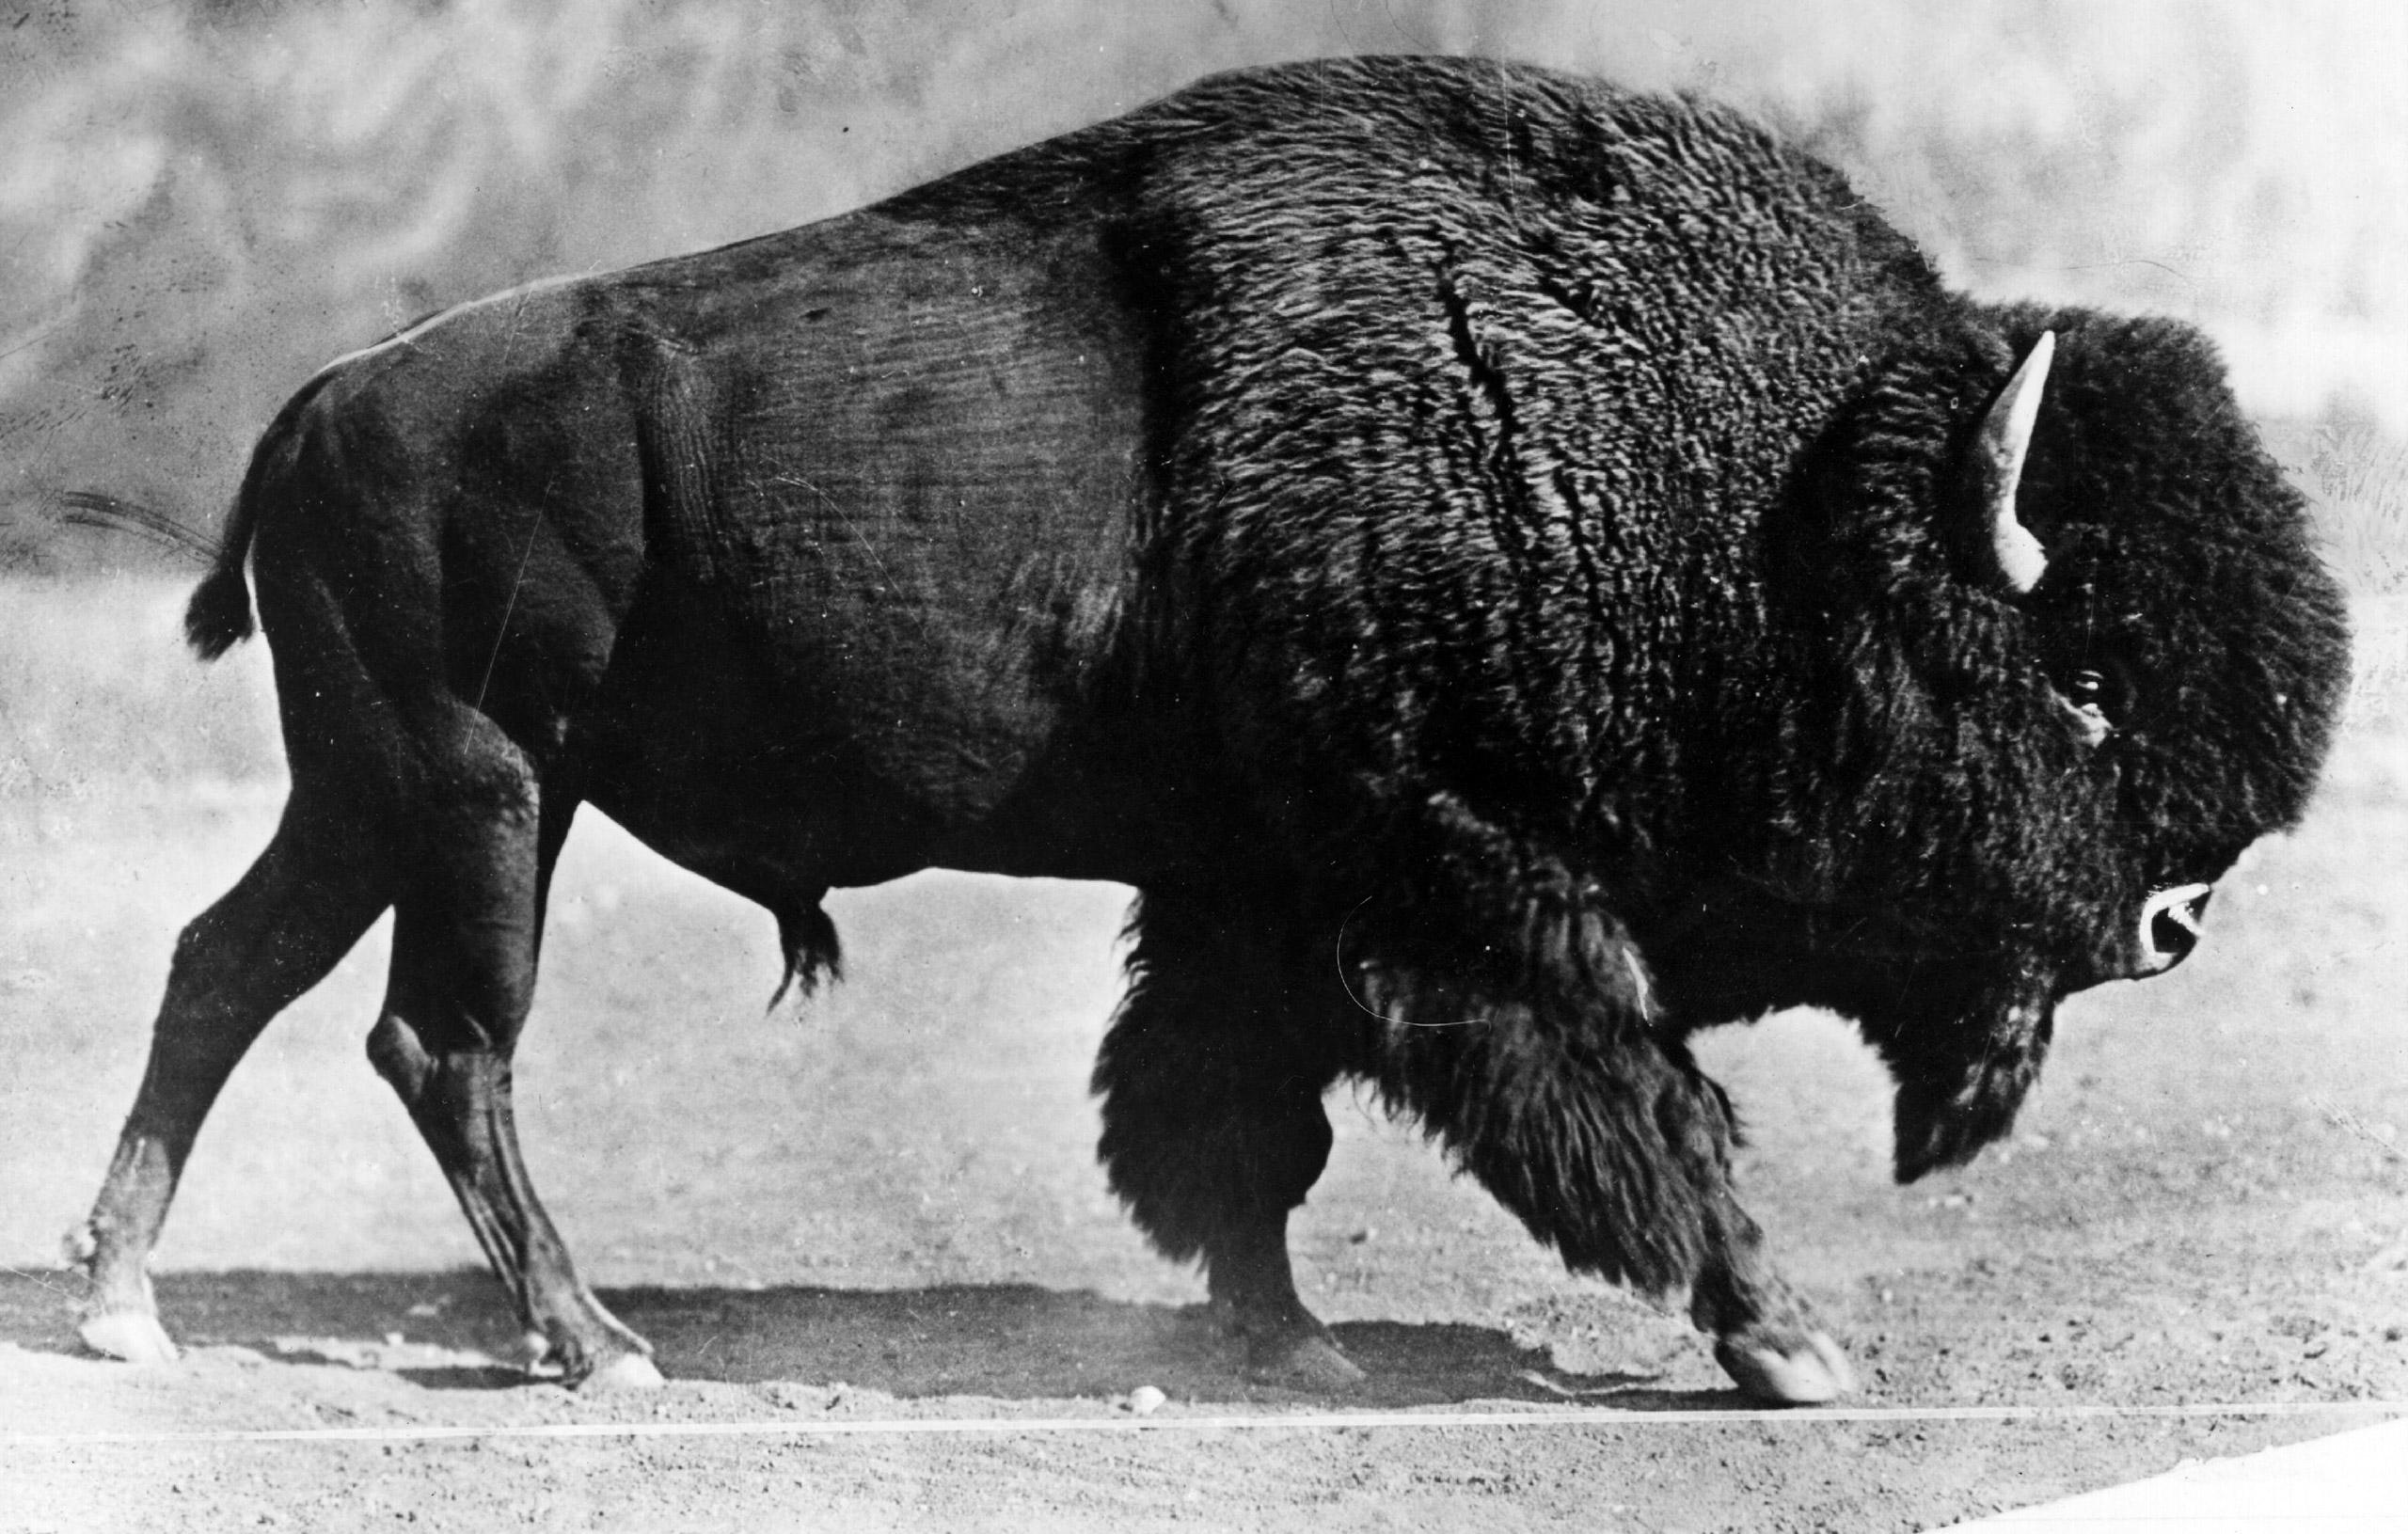 An American bison, circa 1930.